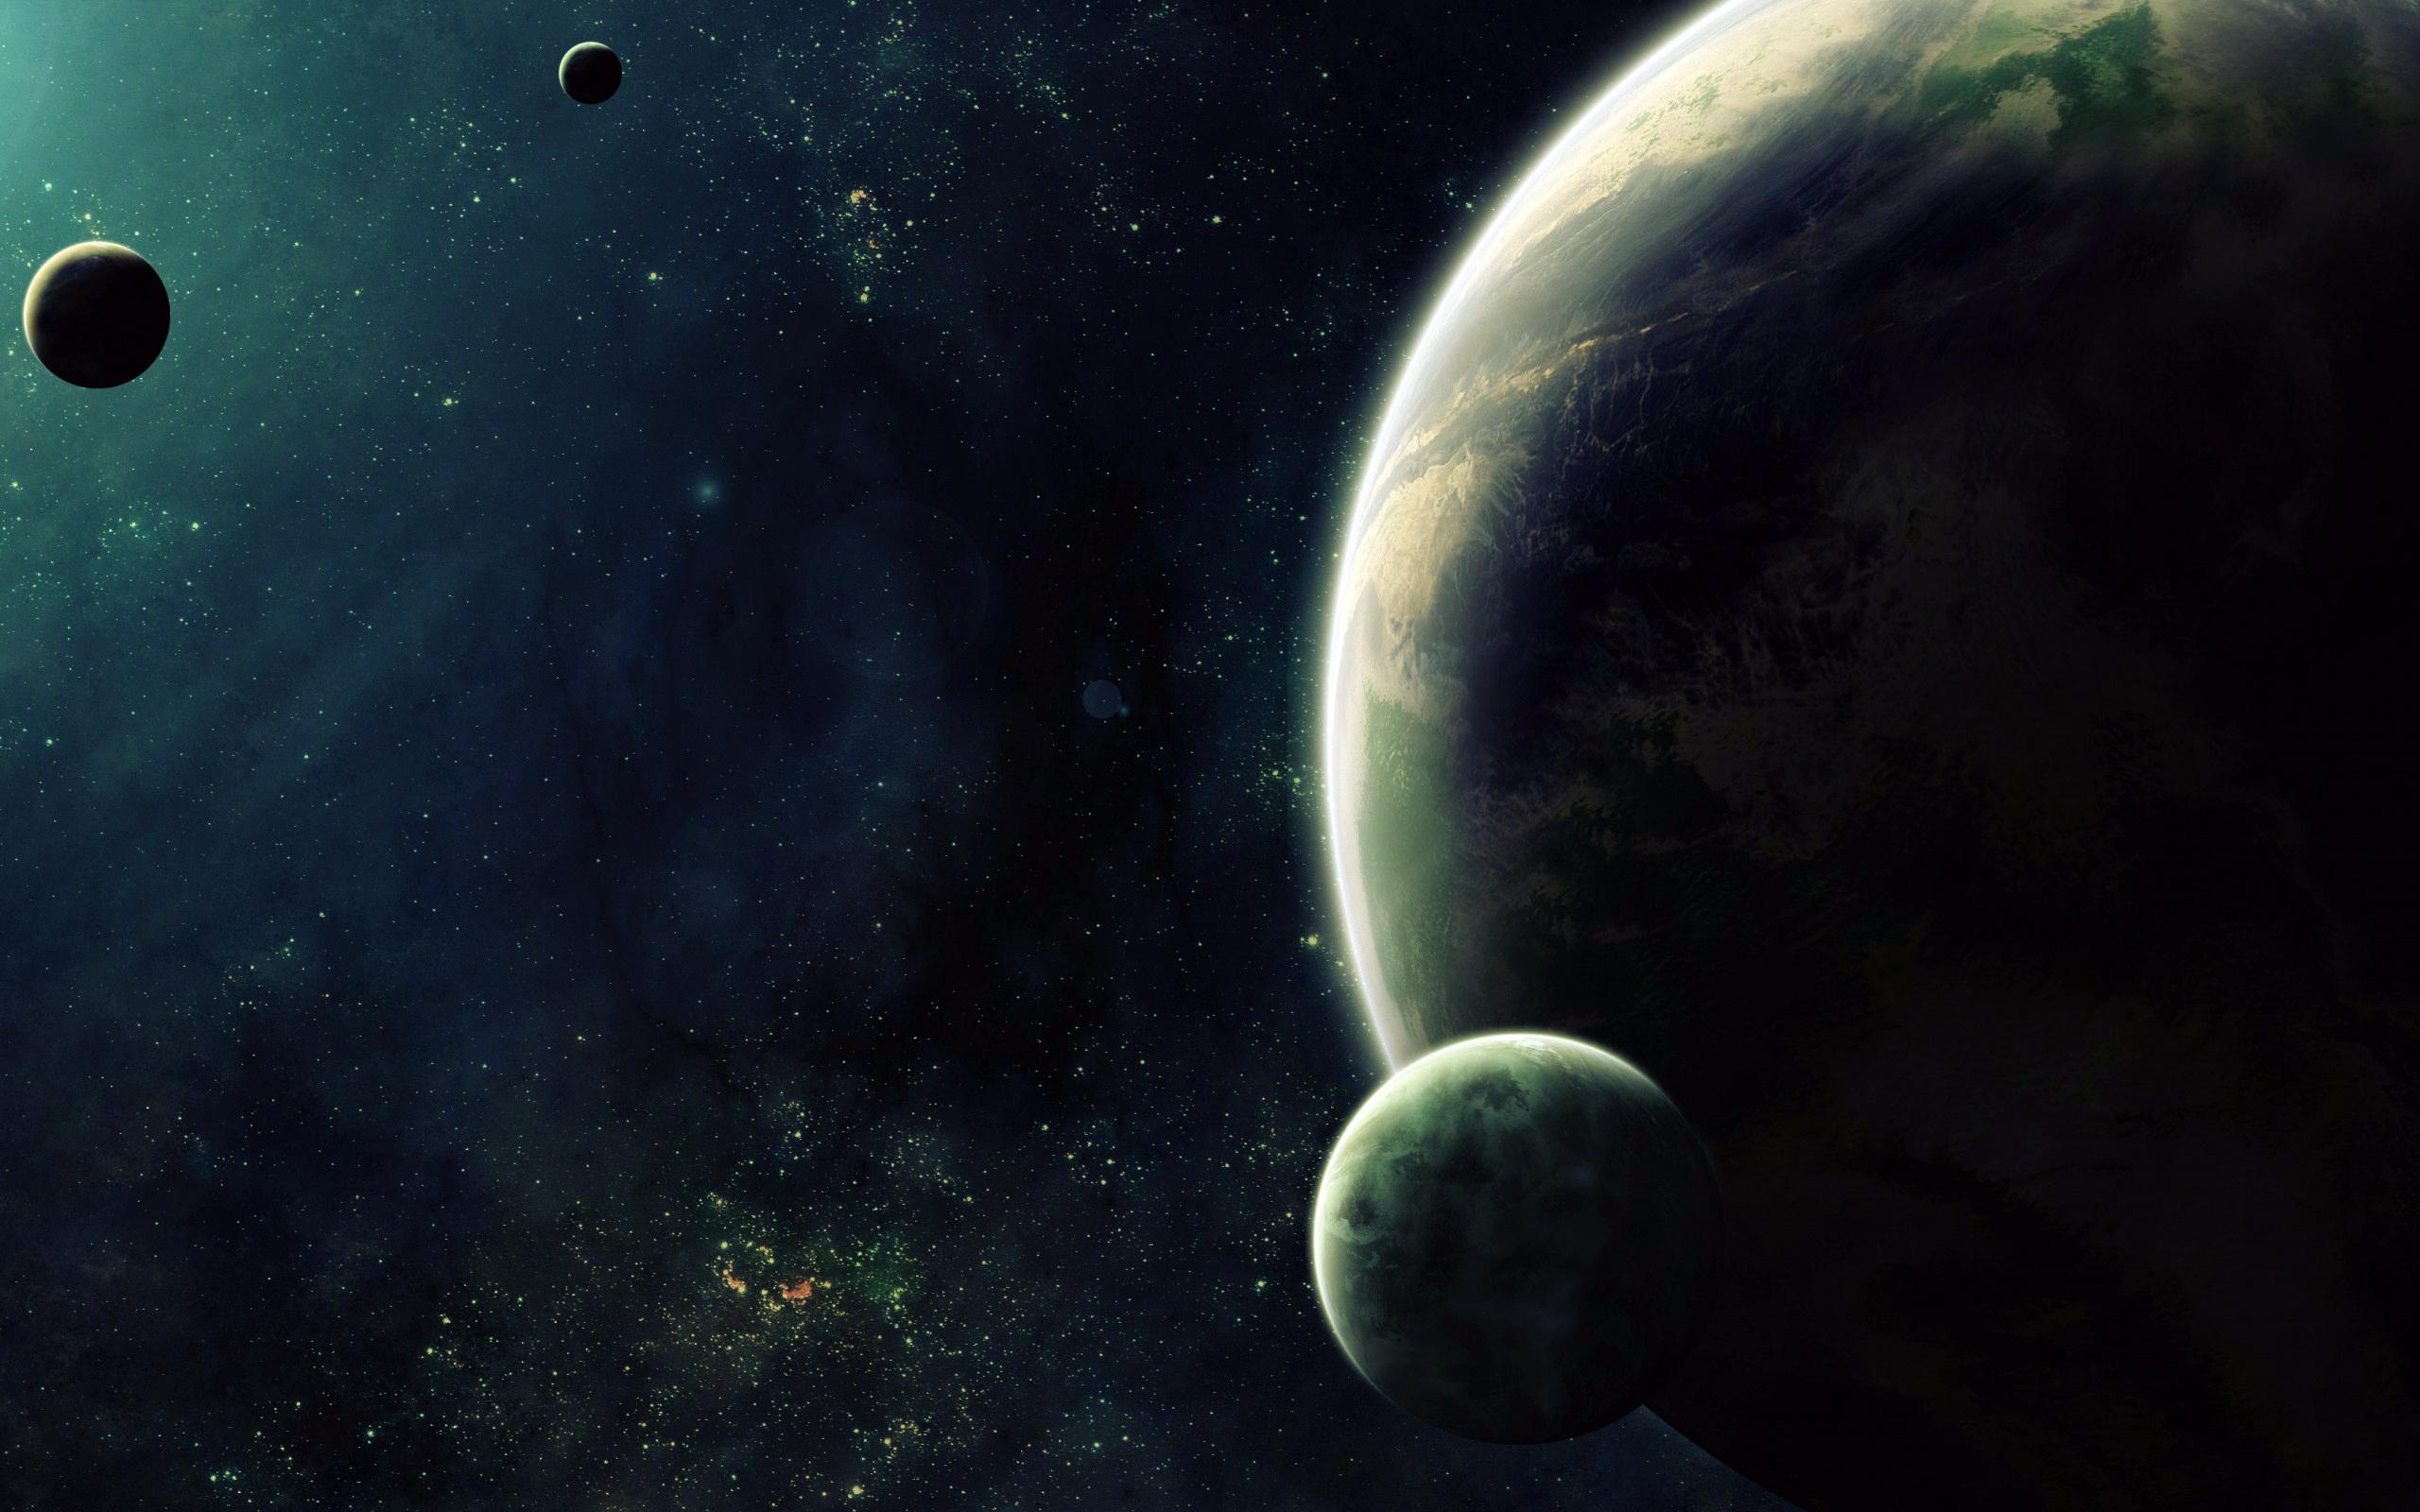 зелёно-кварцевая  планета с тремя спутниками, вселенная, звёзды